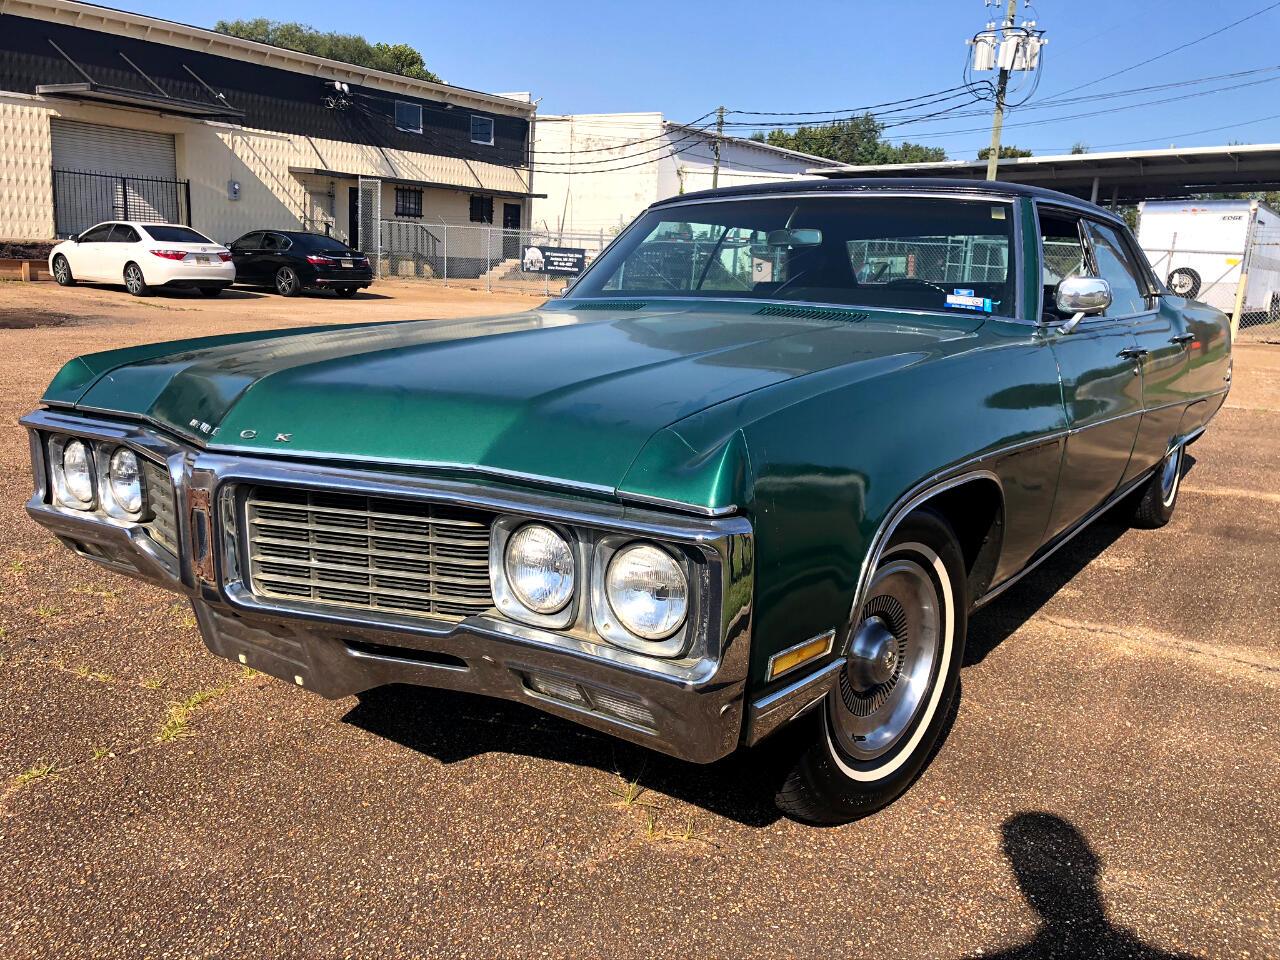 used cars for sale jackson ms 39213 north jackson auto sales jackson ms 39213 north jackson auto sales